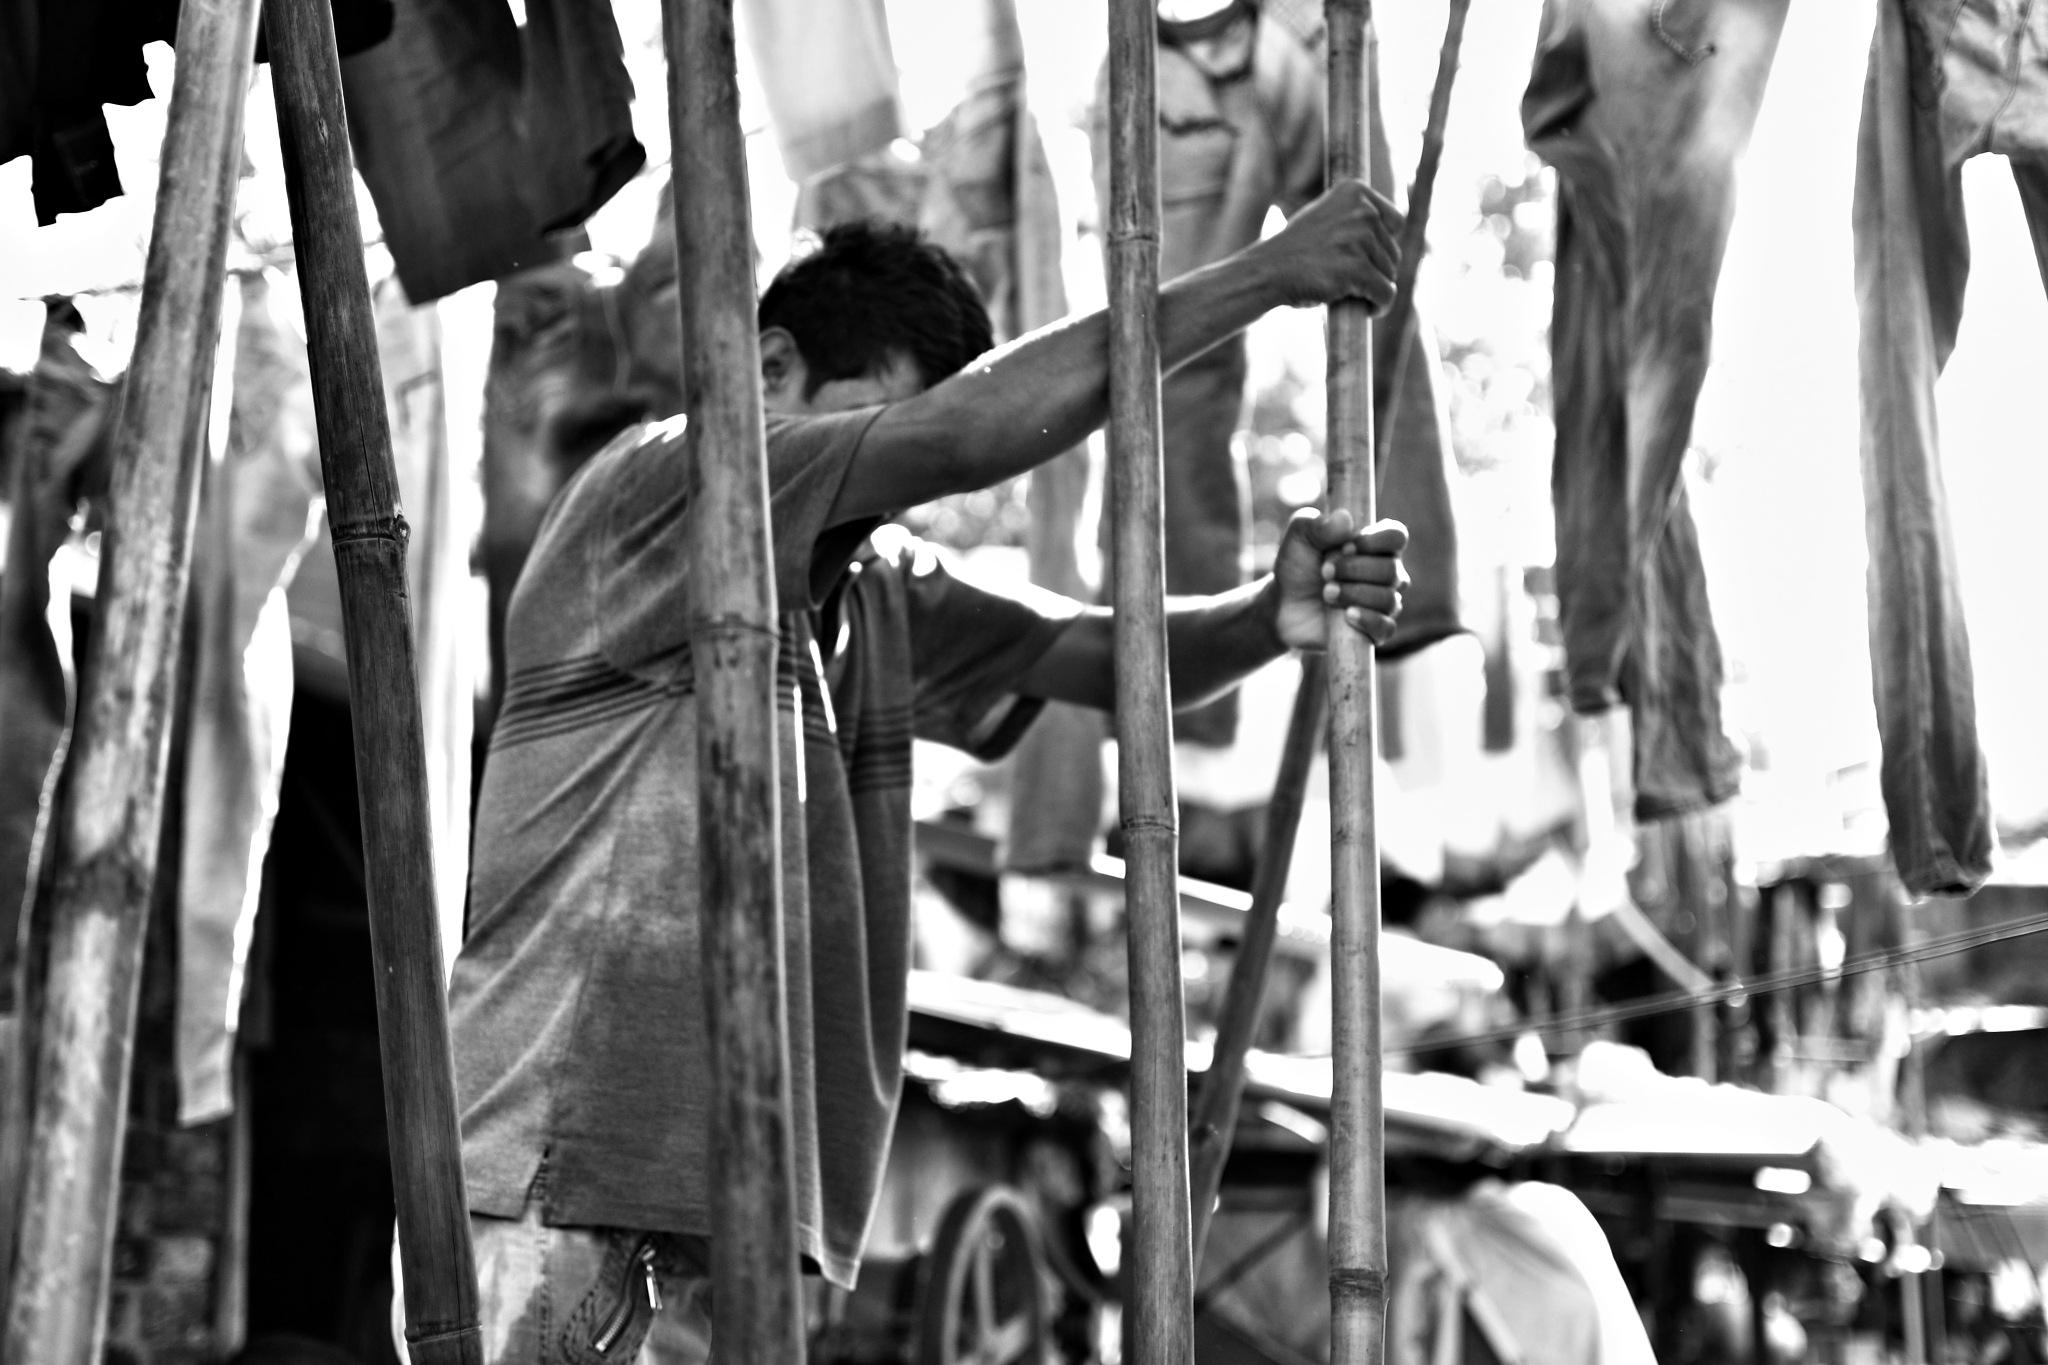 A washer at Dhobhighat. by Pratik Tambe